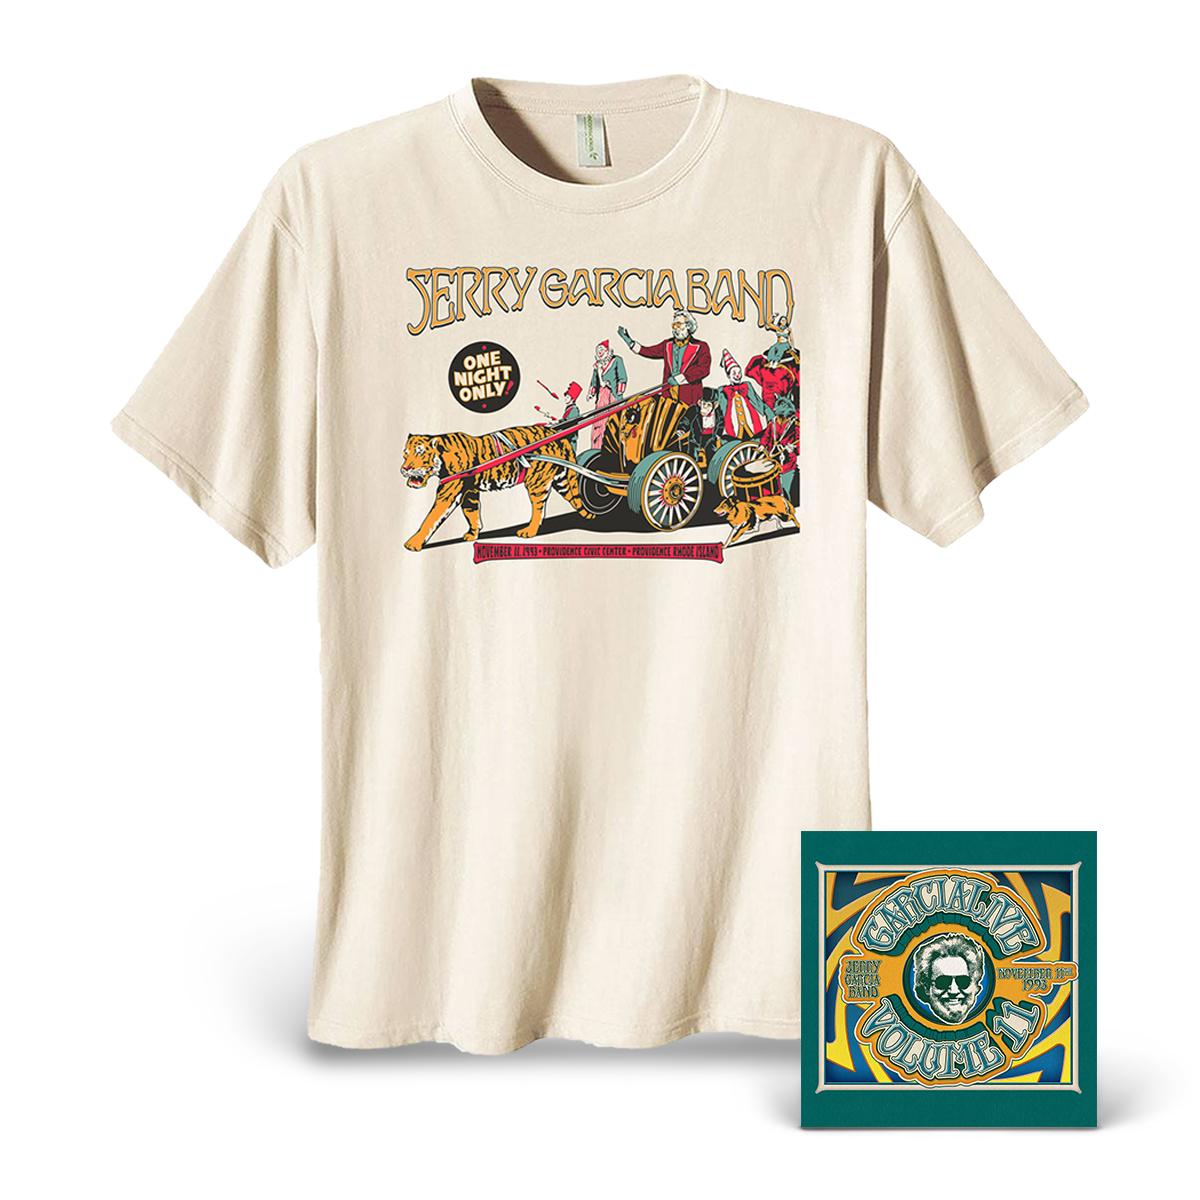 Jerry Garcia Band – GarciaLive Volume 11: 11/11/93 CDs or Download & Organic T-Shirt Bundle